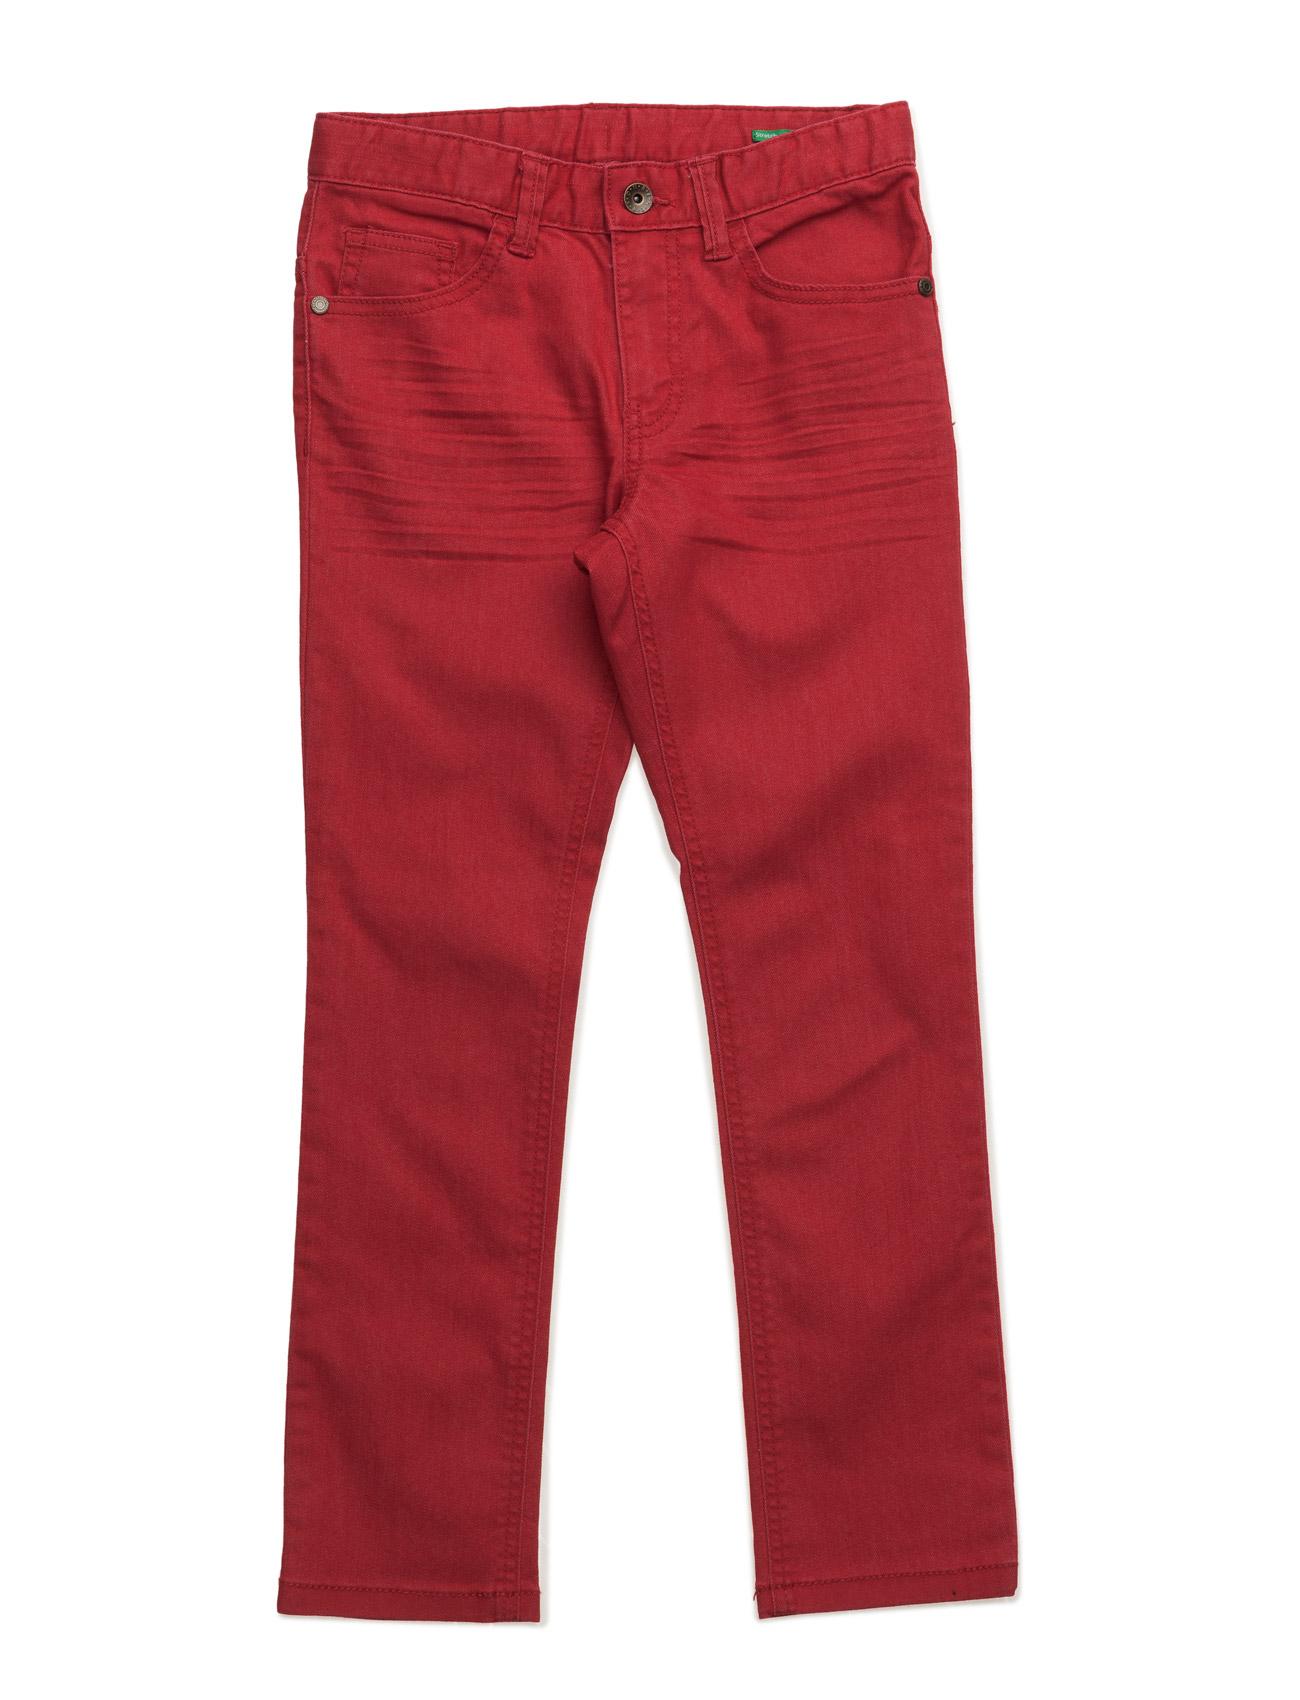 Trousers United Colors of Benetton  til Børn i Rød